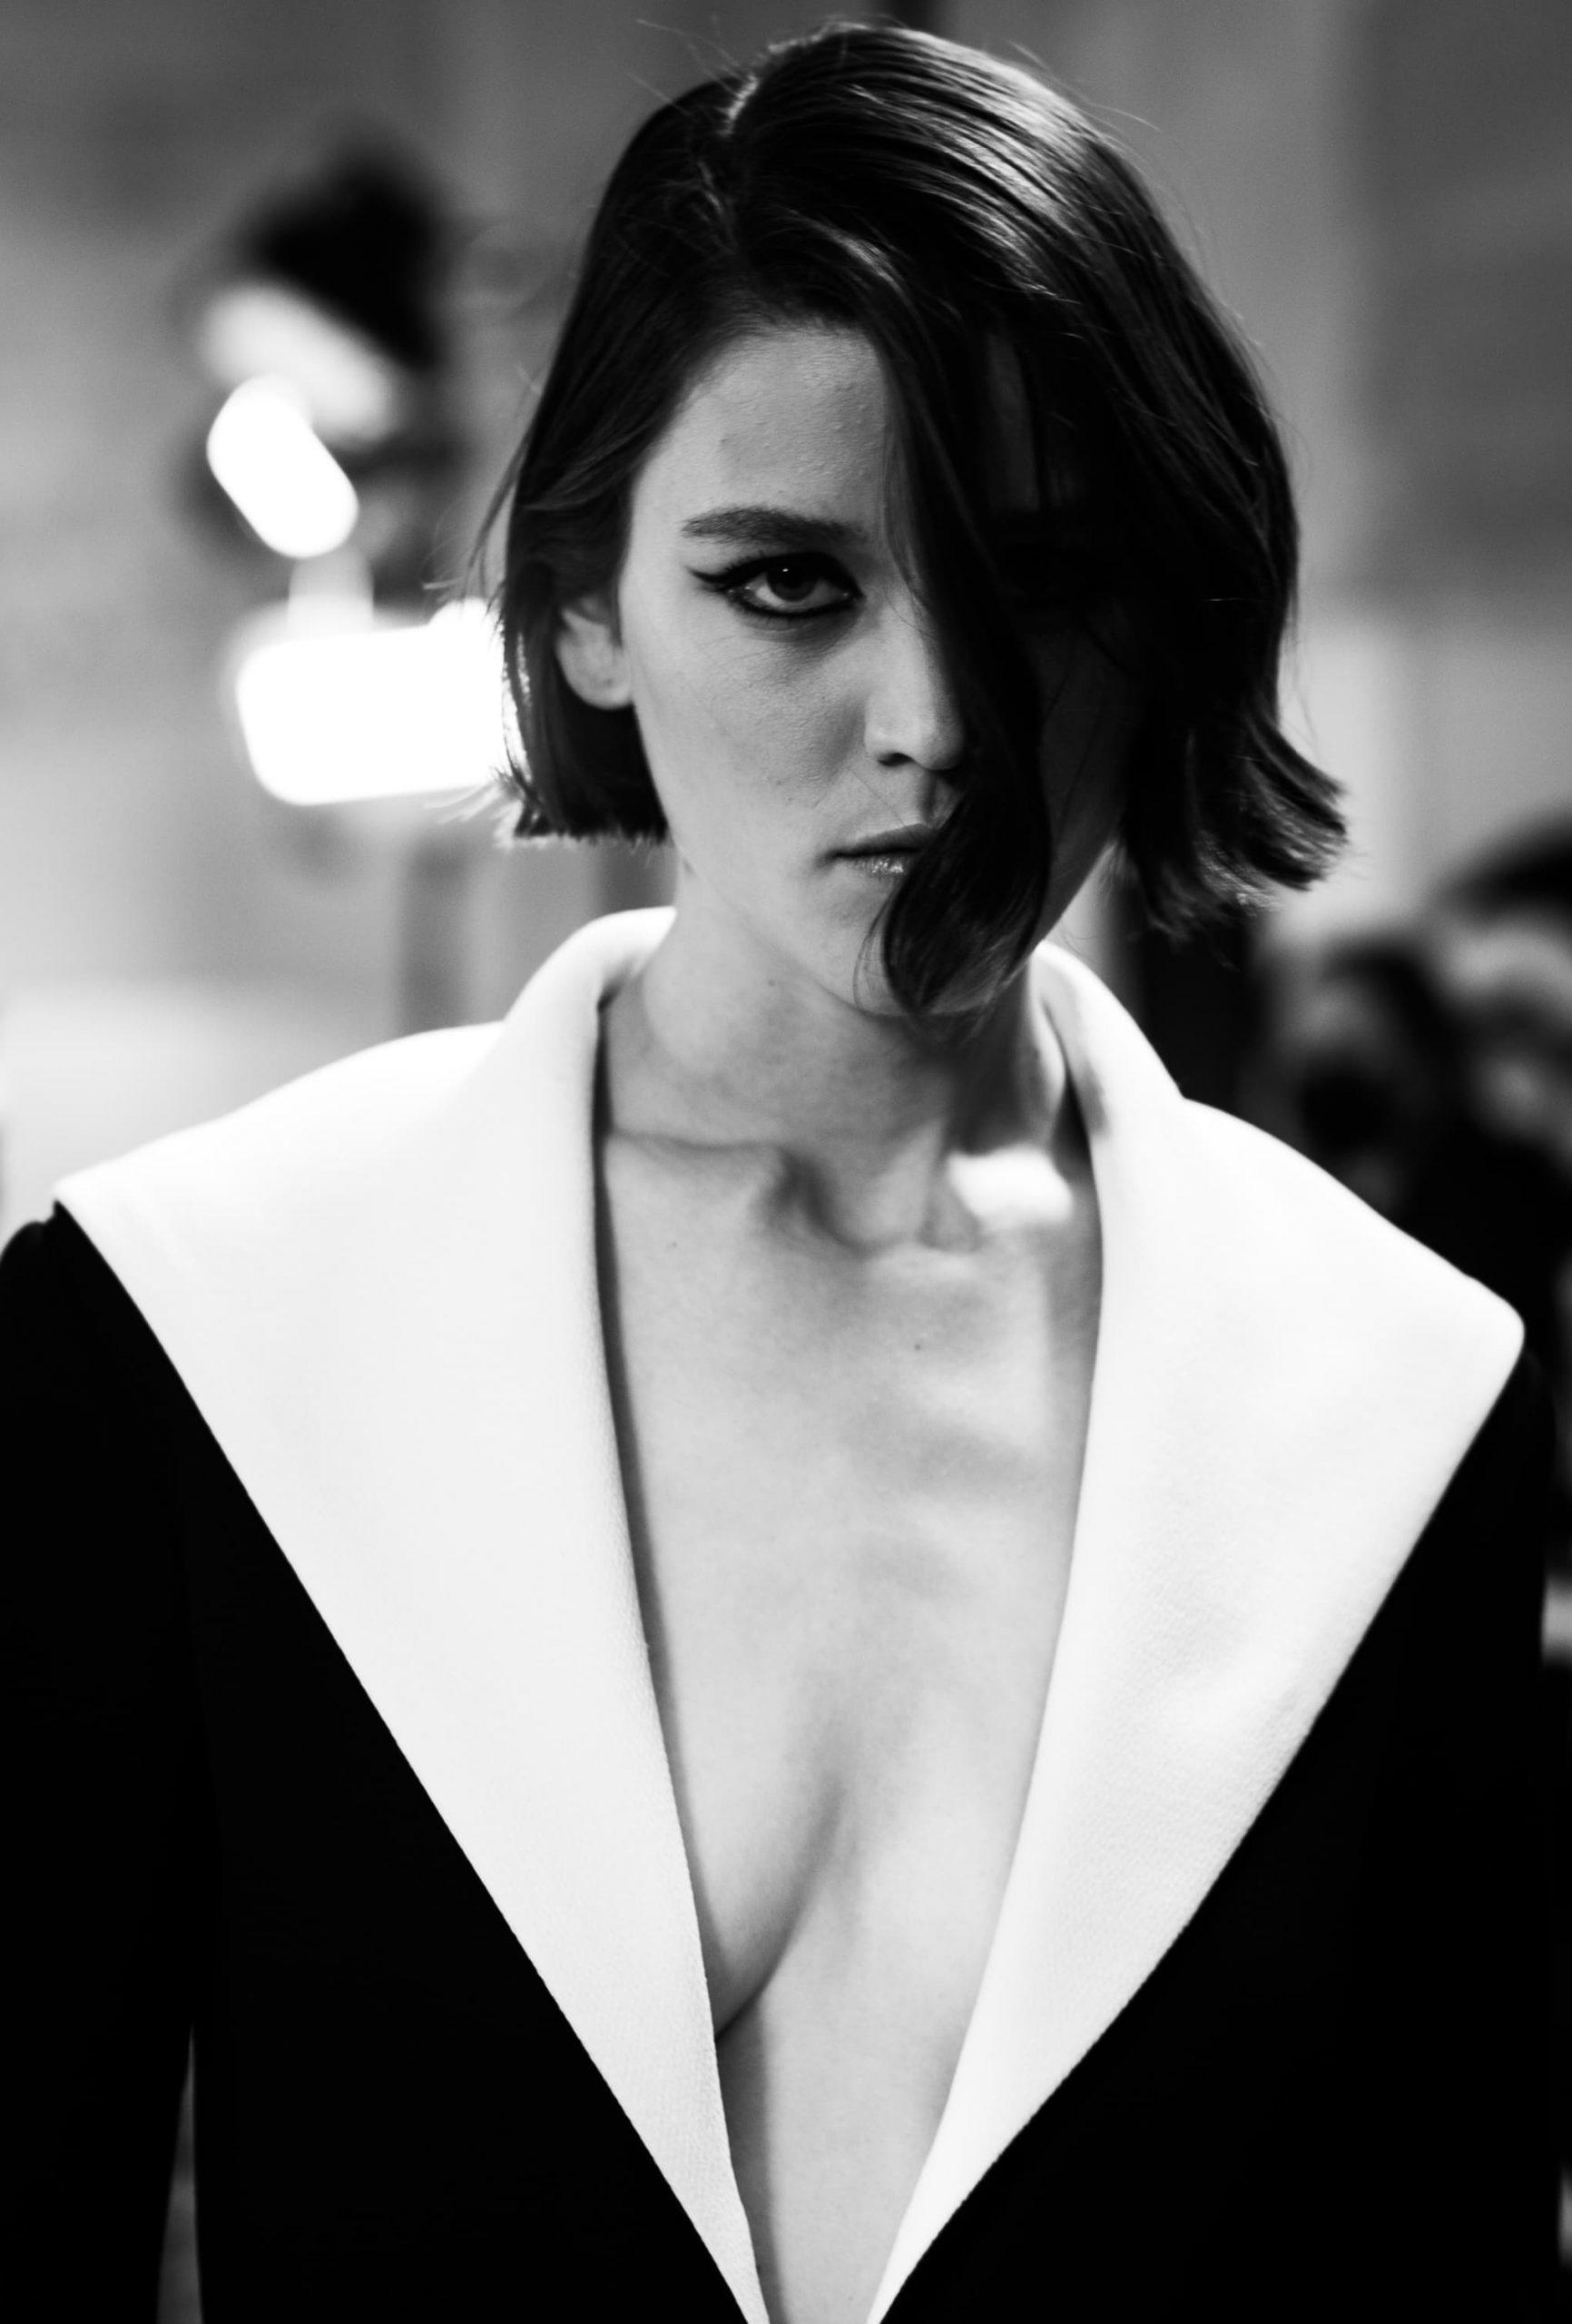 Chanel Resort 2022 Fashion Show Details